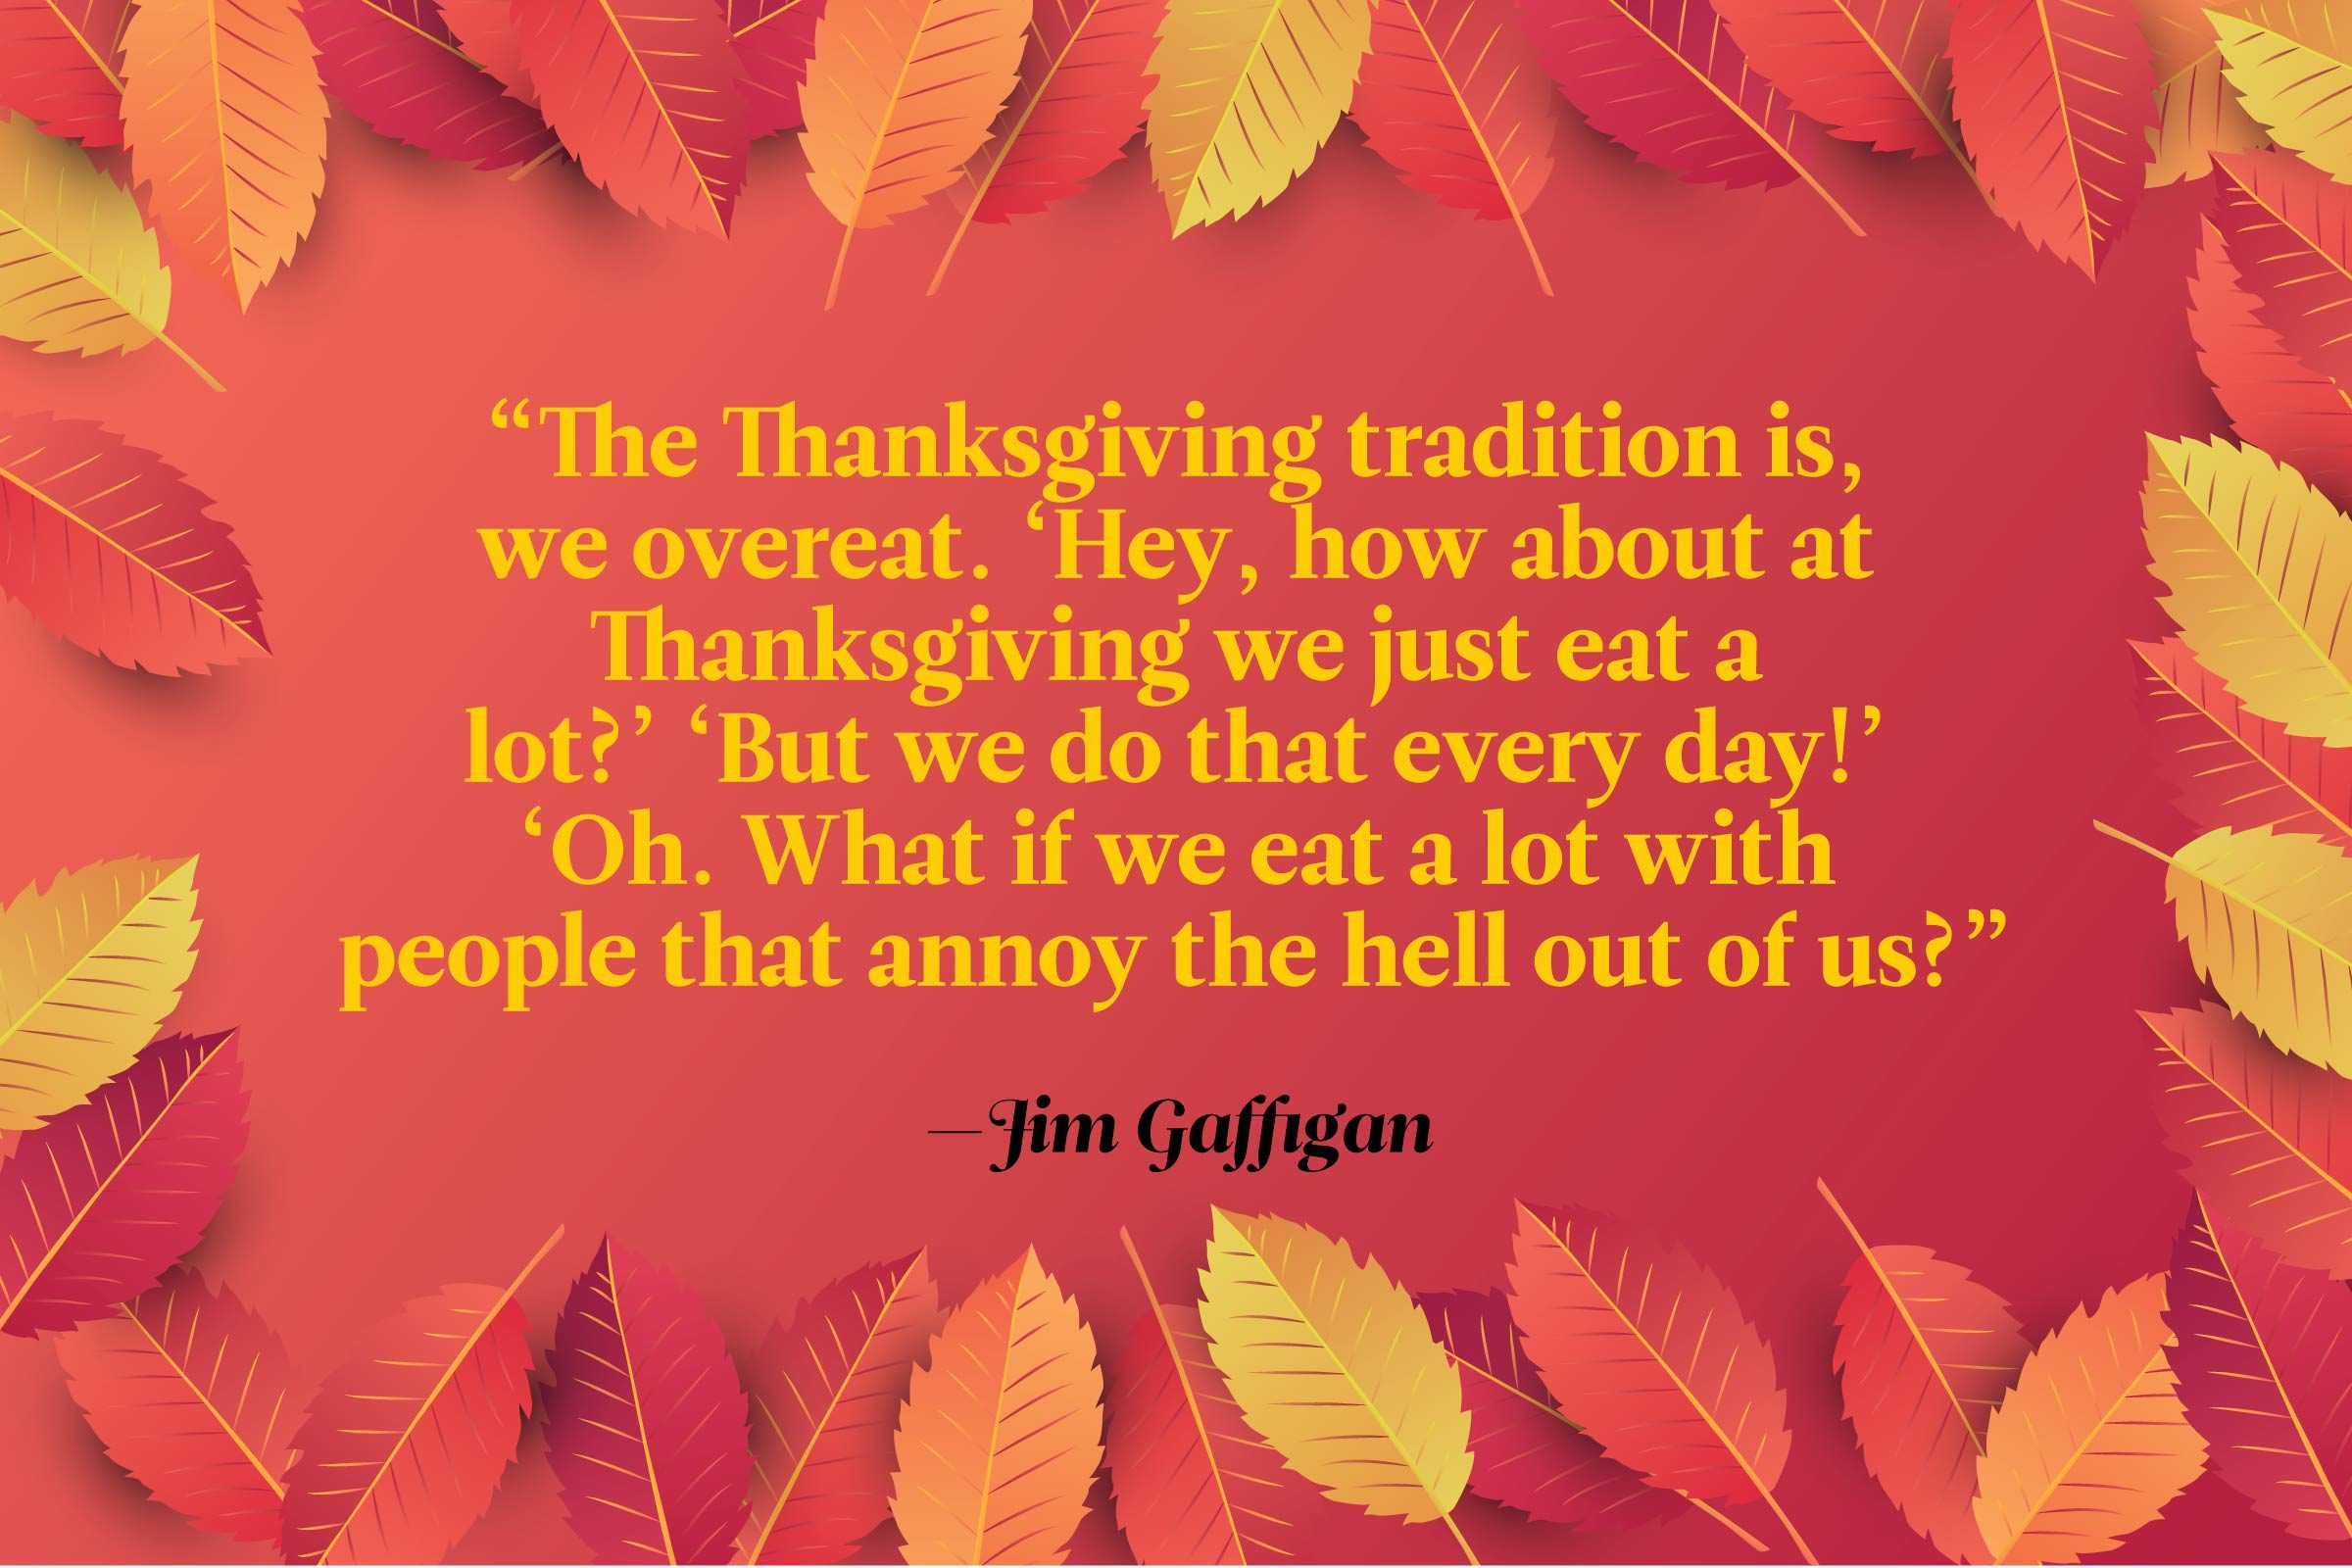 Funny Thanksgiving Quotes - Jim Gaffigan